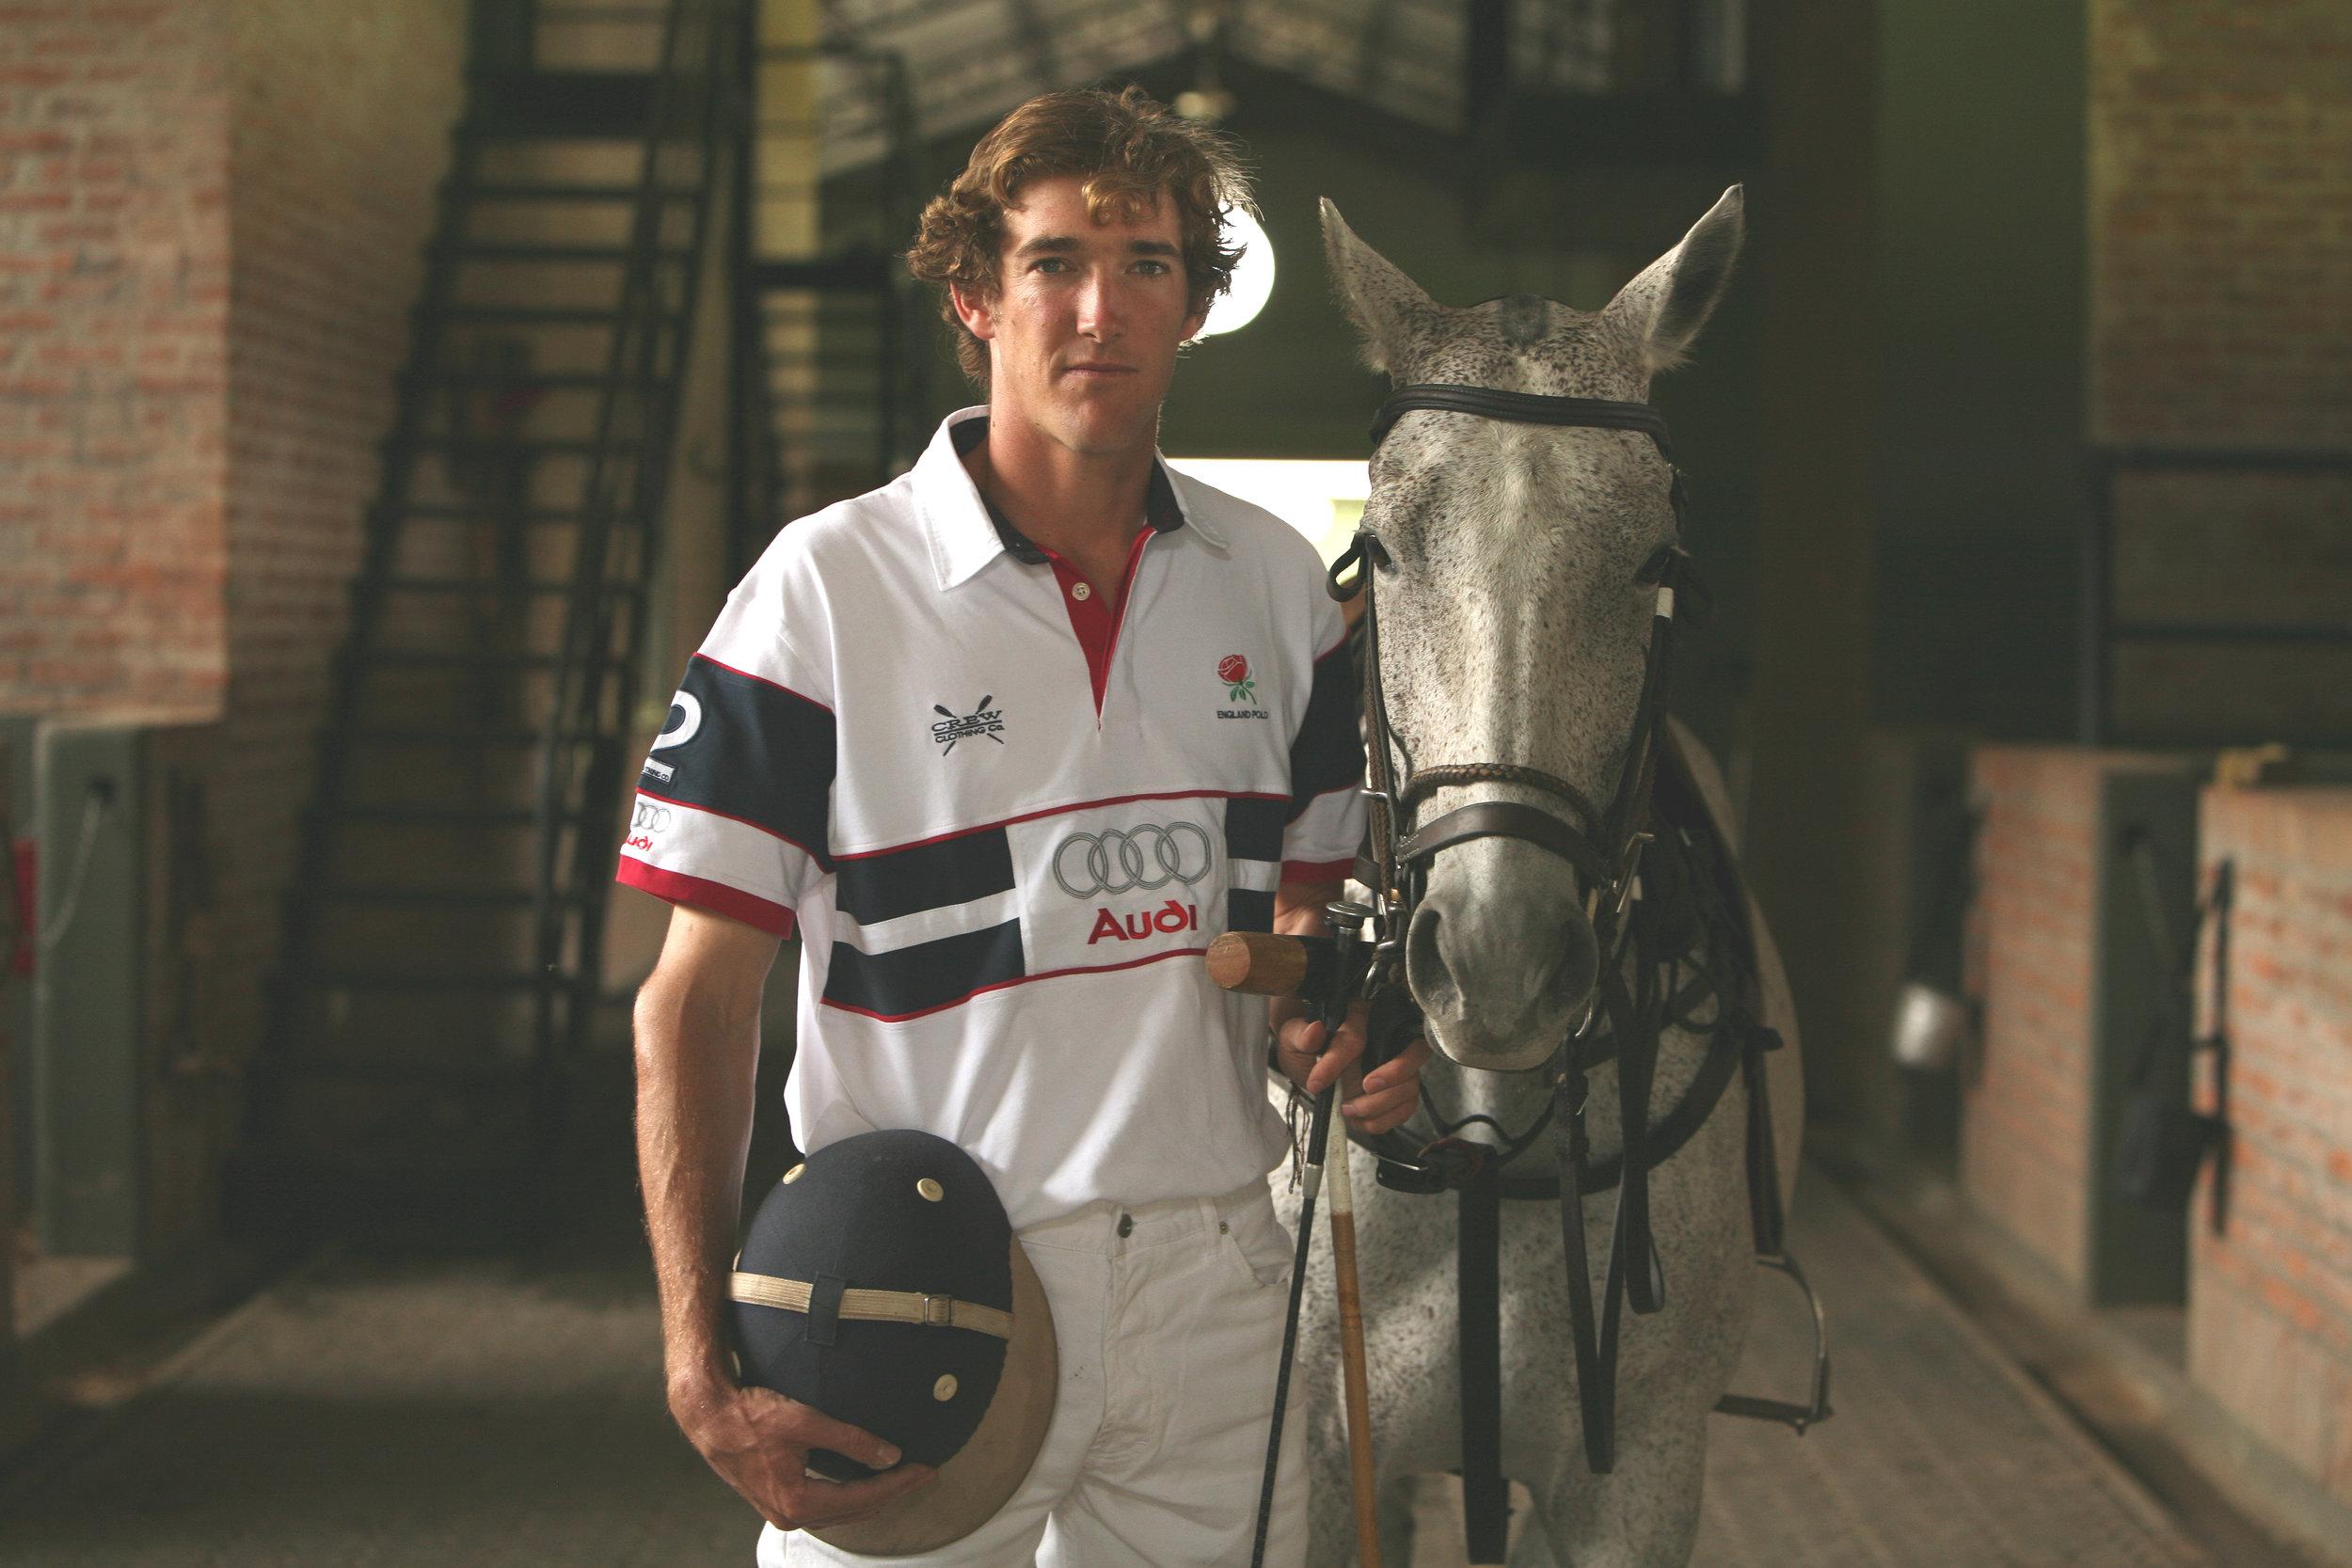 Argentina - England Polo, Audi, GQ magazine.